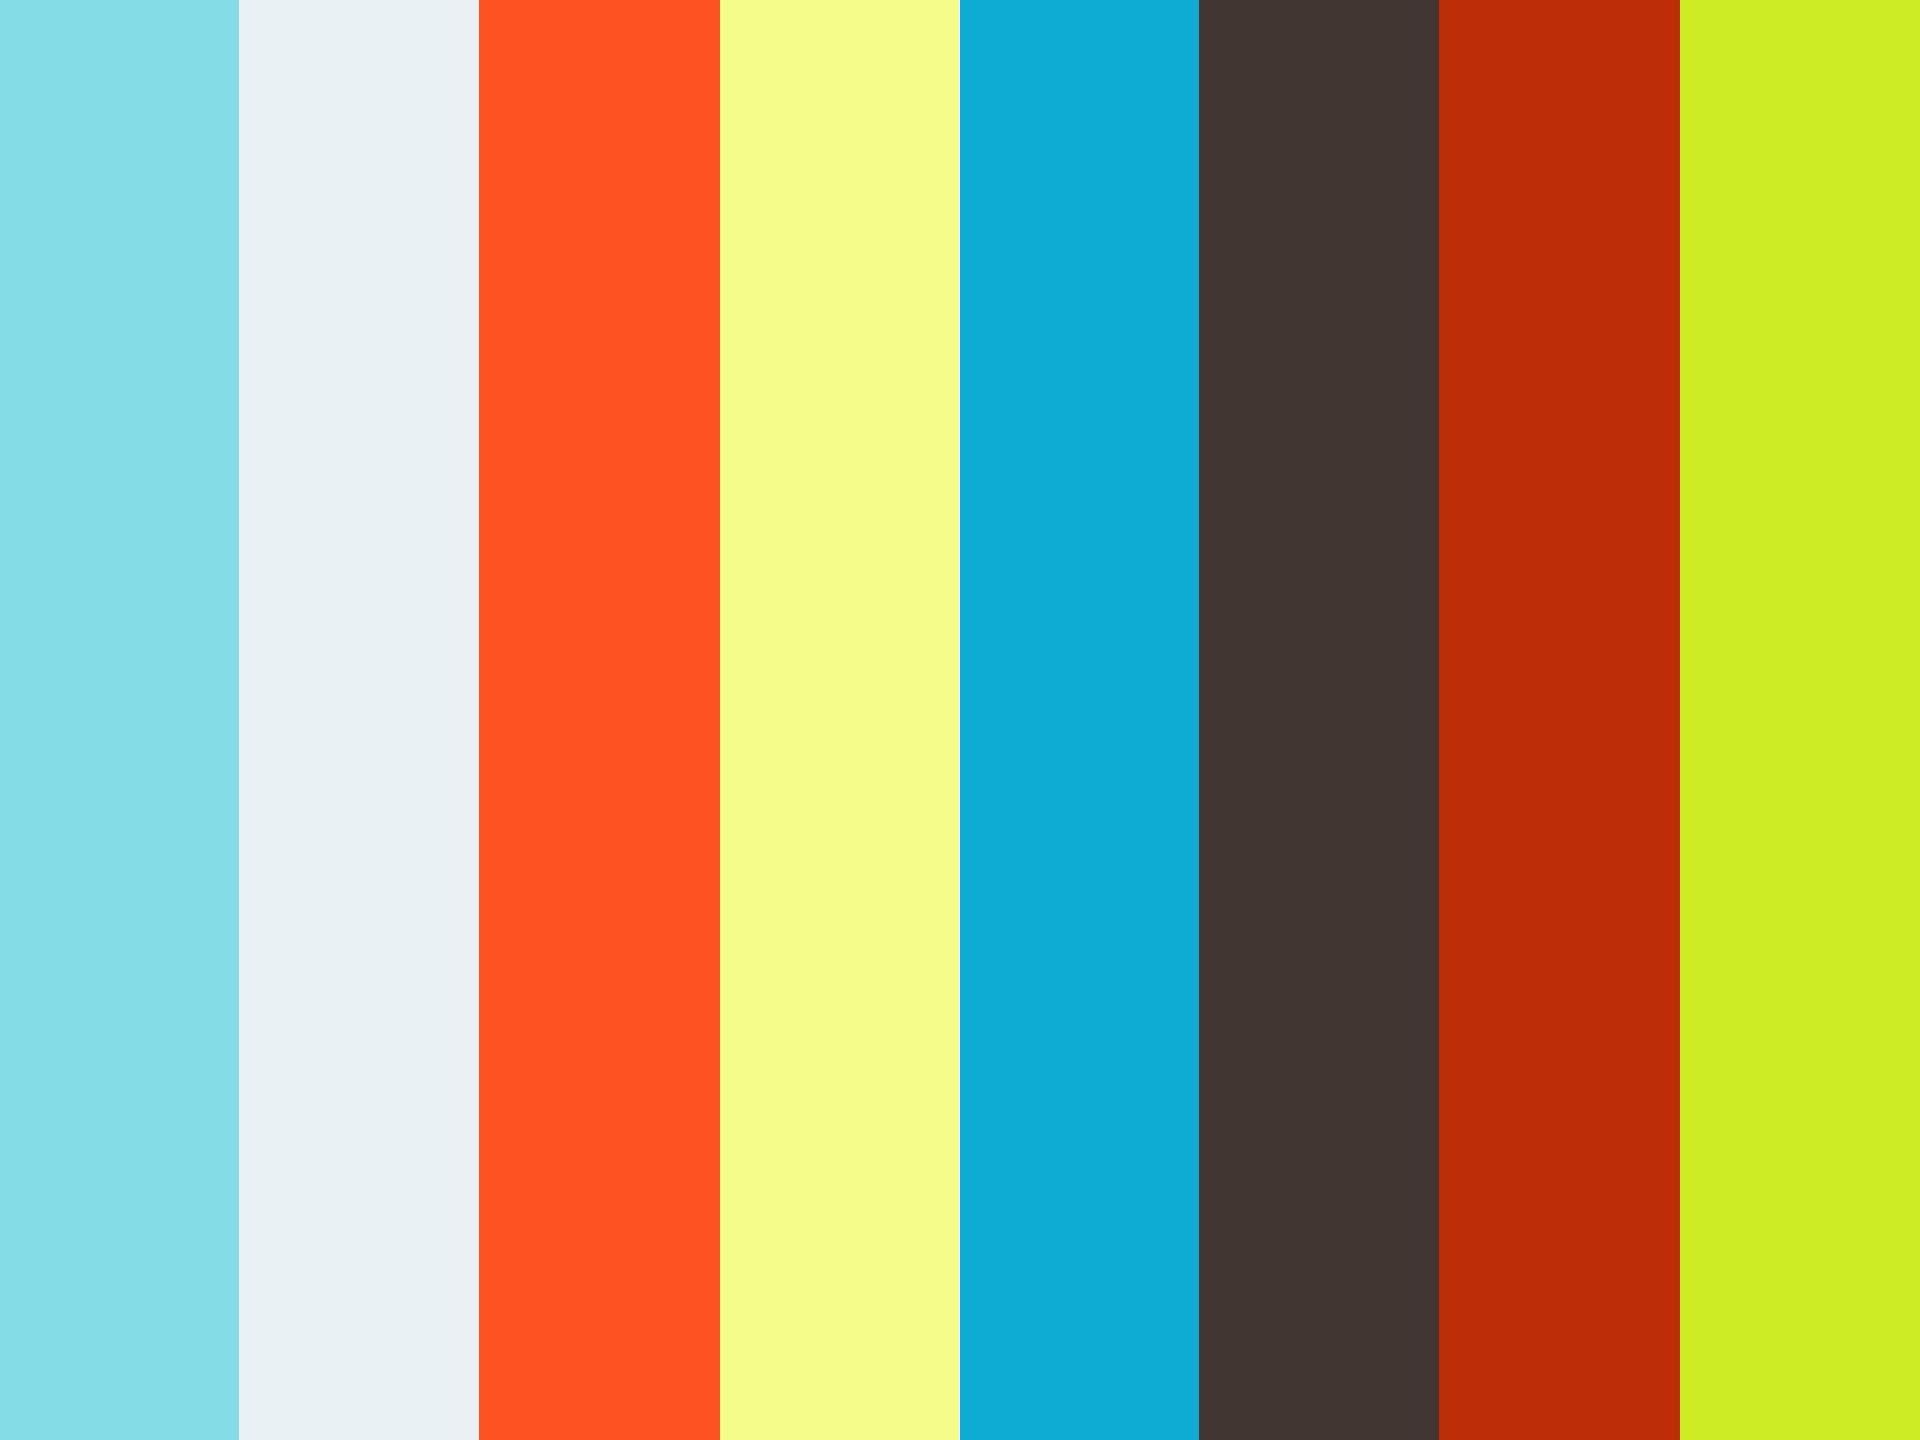 Andy Hume — Real-Life Responsive Web Design (SmashingConf 2013, Freiburg)